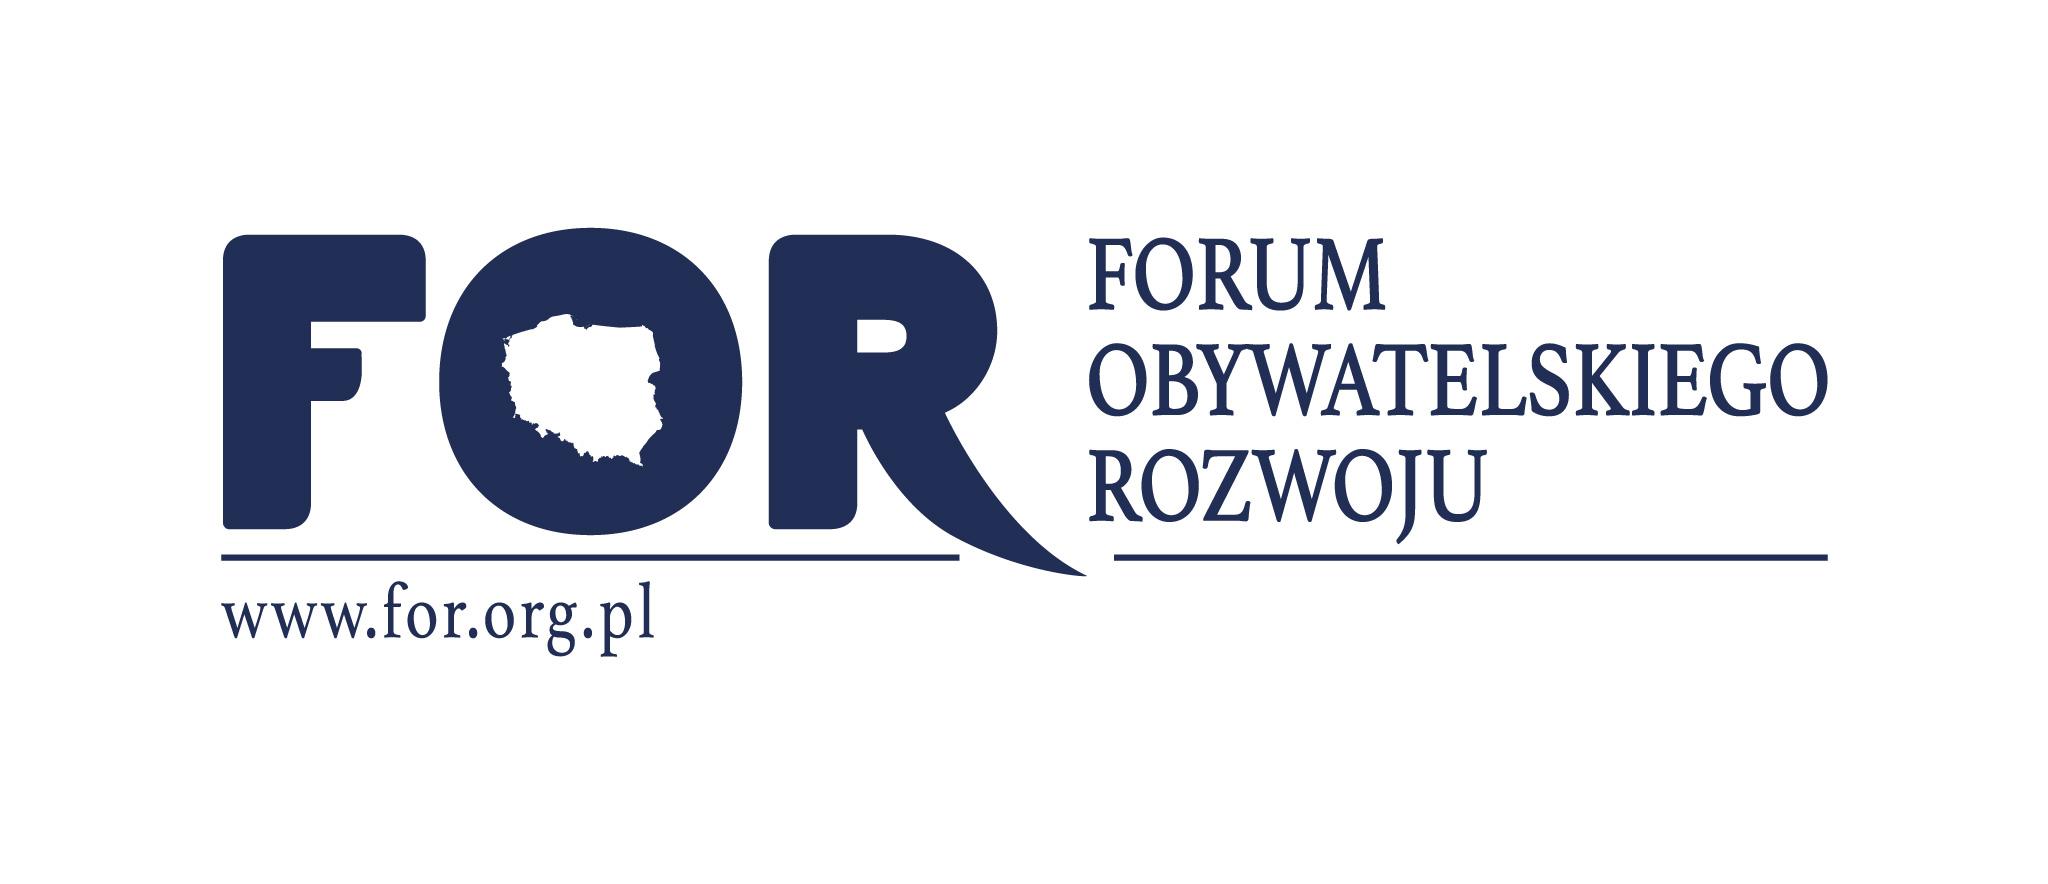 Civil Development Forum